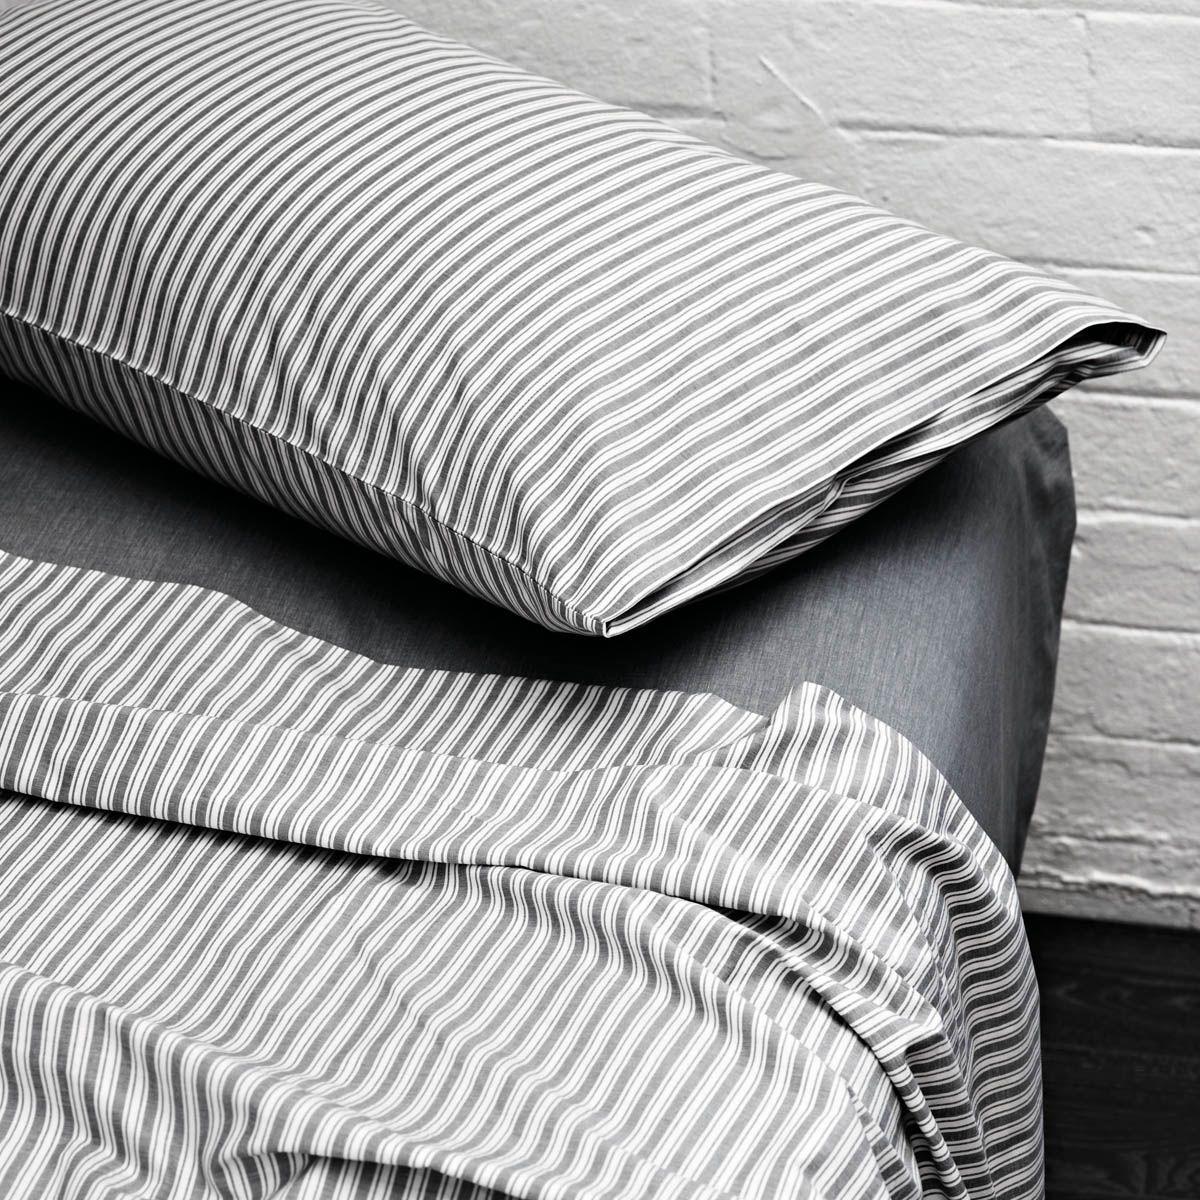 Ticking Stripe Sheet Set Striped Bed Sheets Striped Sheets Luxury Sheet Sets